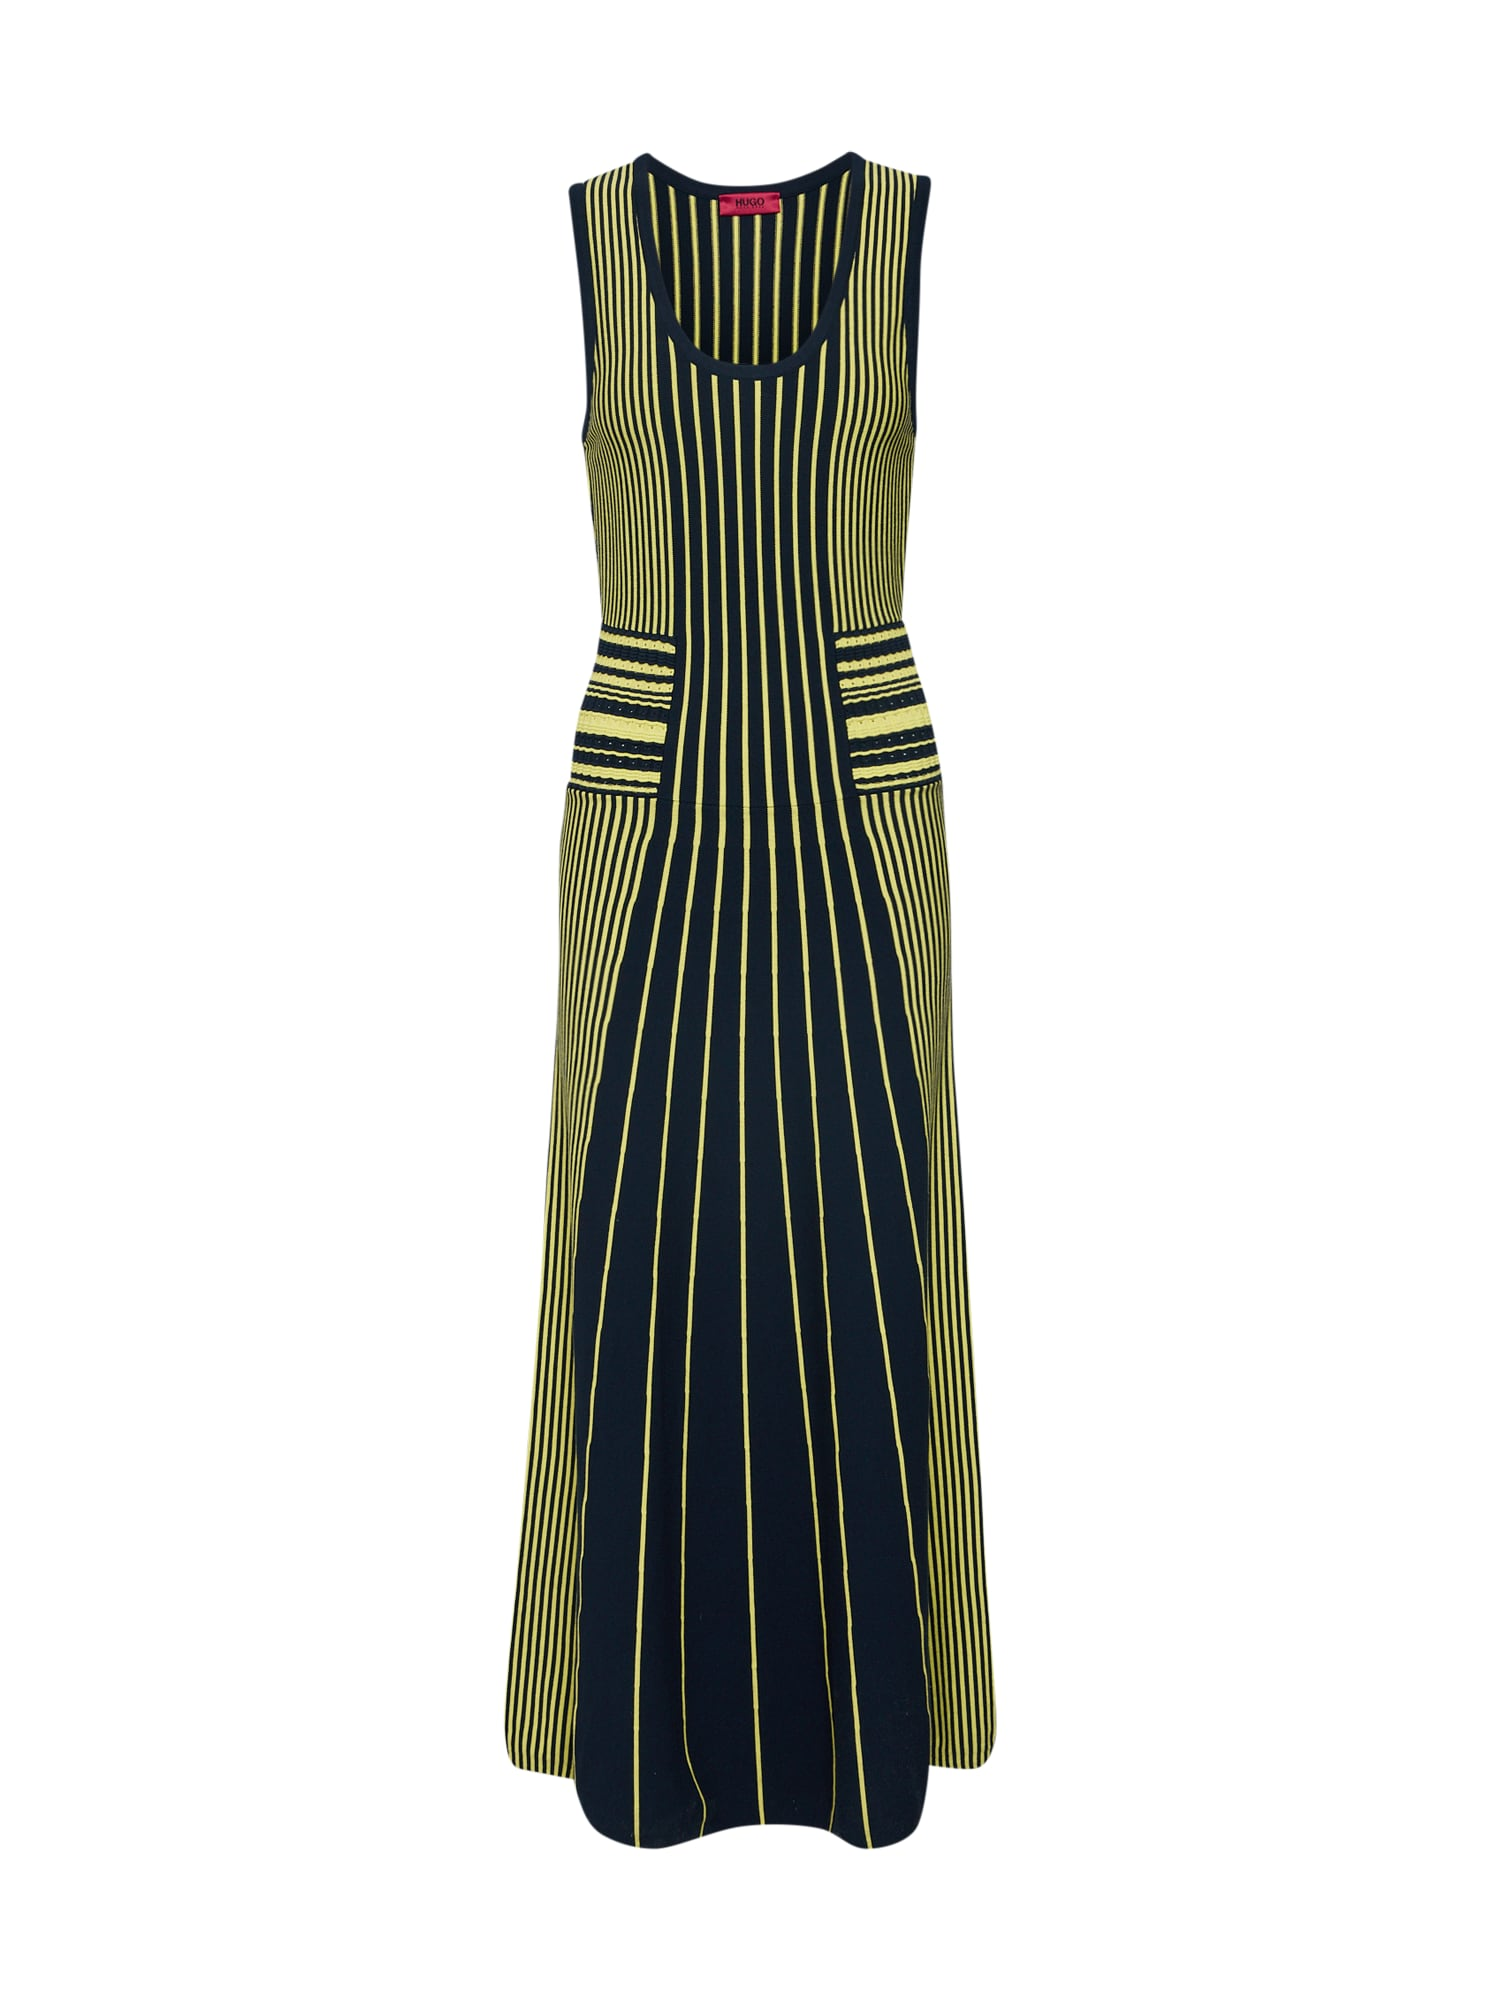 Šaty Silbiana modrá žlutá HUGO